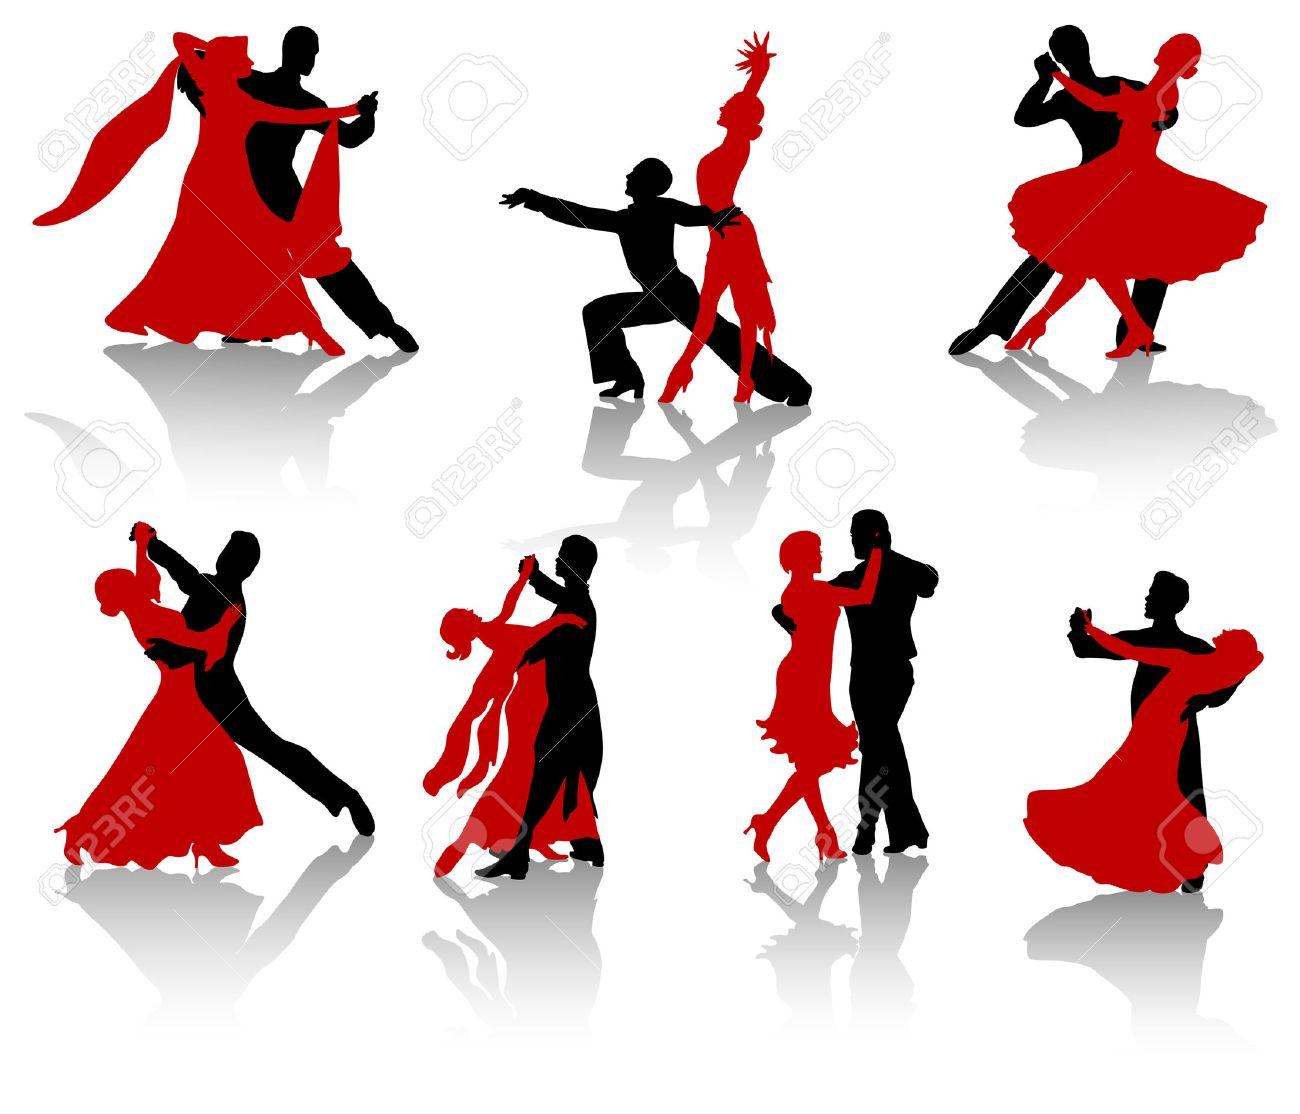 Silhouettes of the pairs dancing ballroom dances. A waltz, a tango, a foxtrot. Stock Vector - 2775958